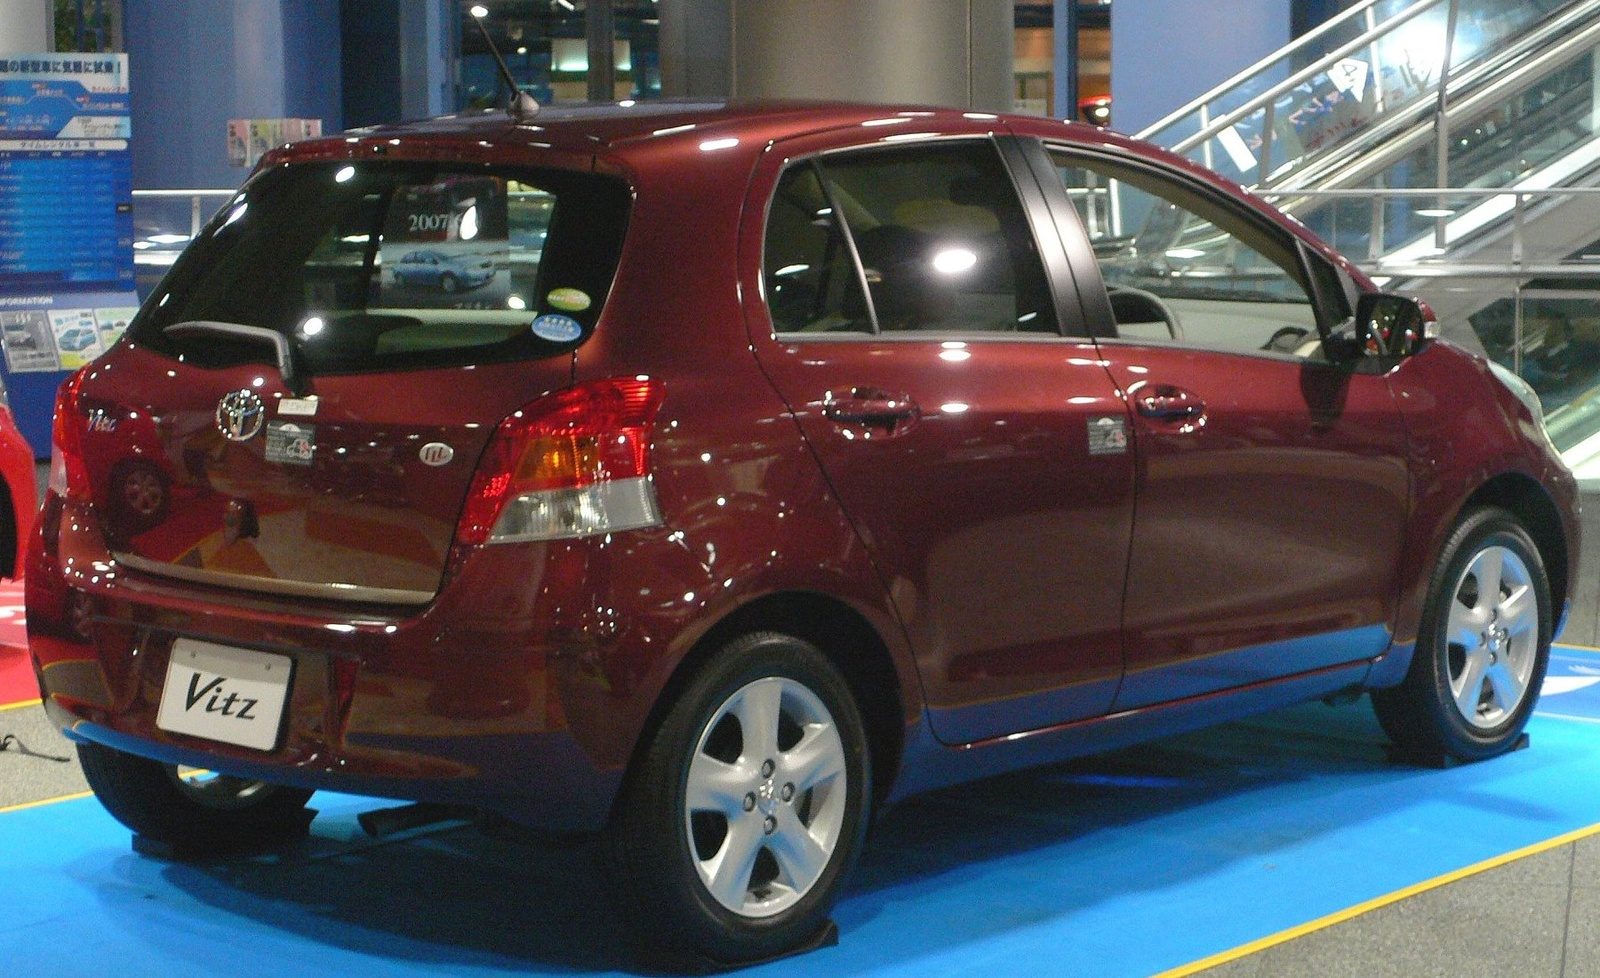 Japanese Car: Toyota Vitz 2010 Model